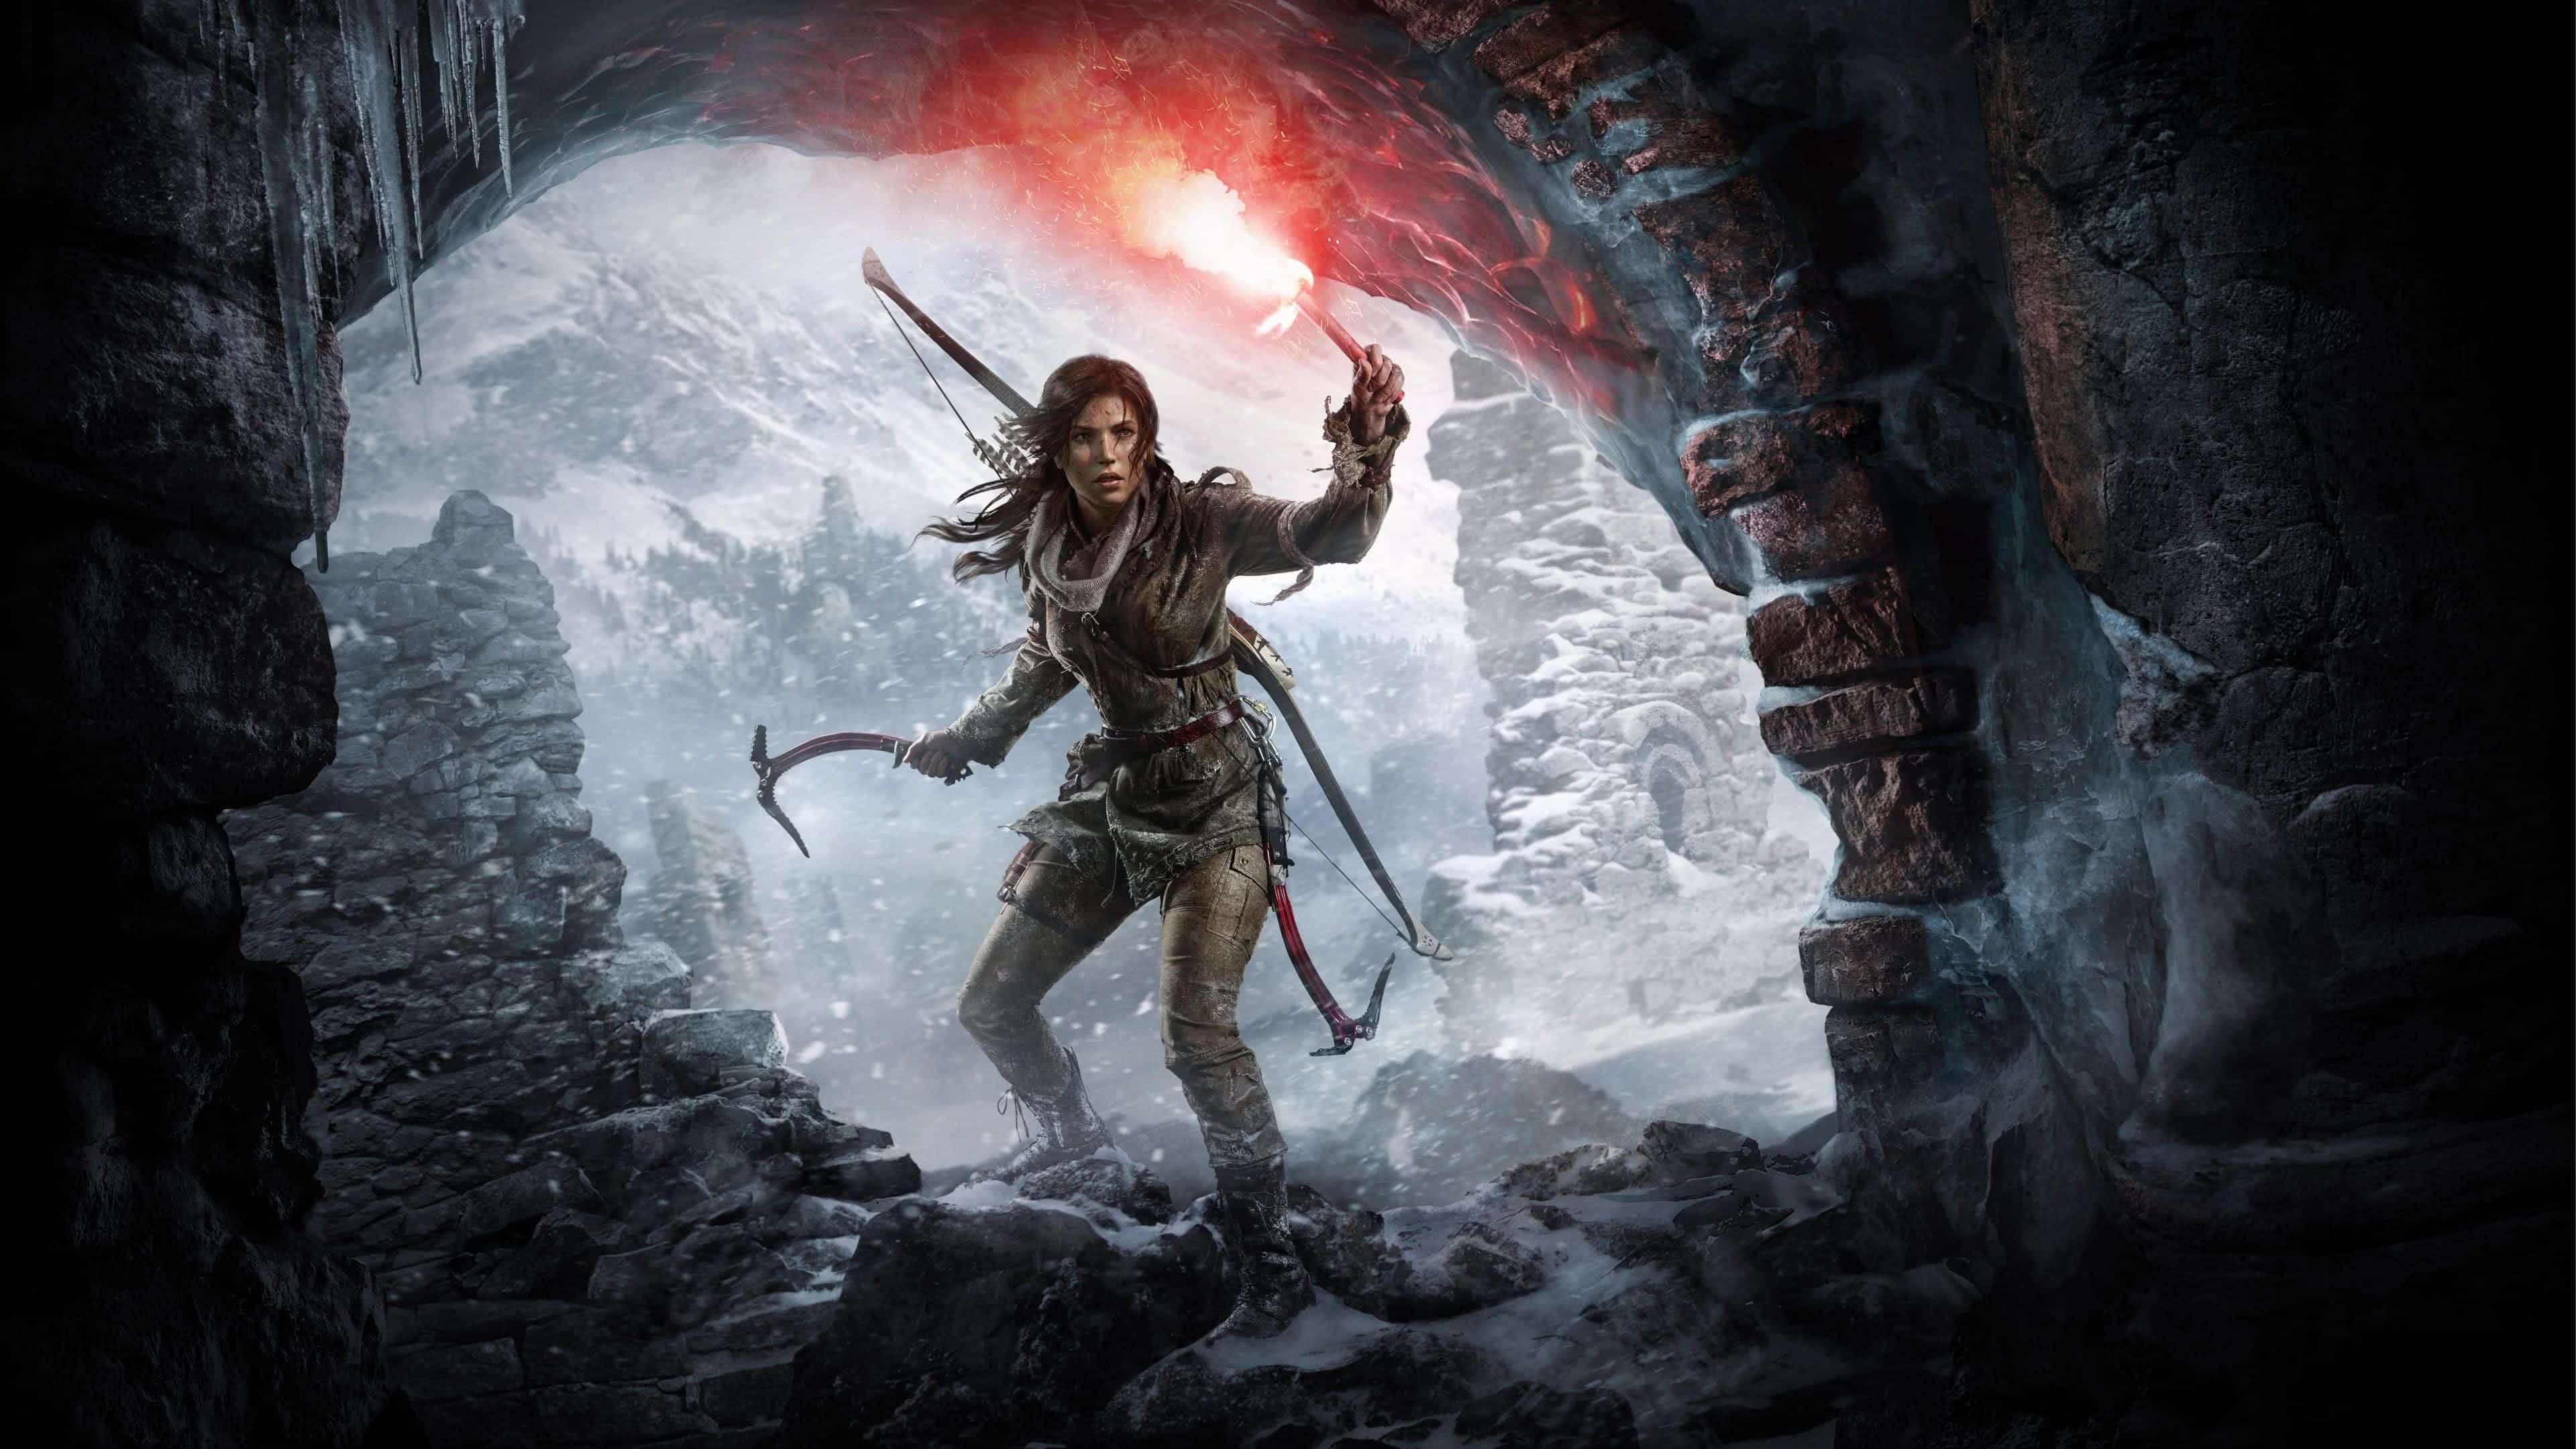 rise of the tomb raider lara croft uhd 4k wallpaper